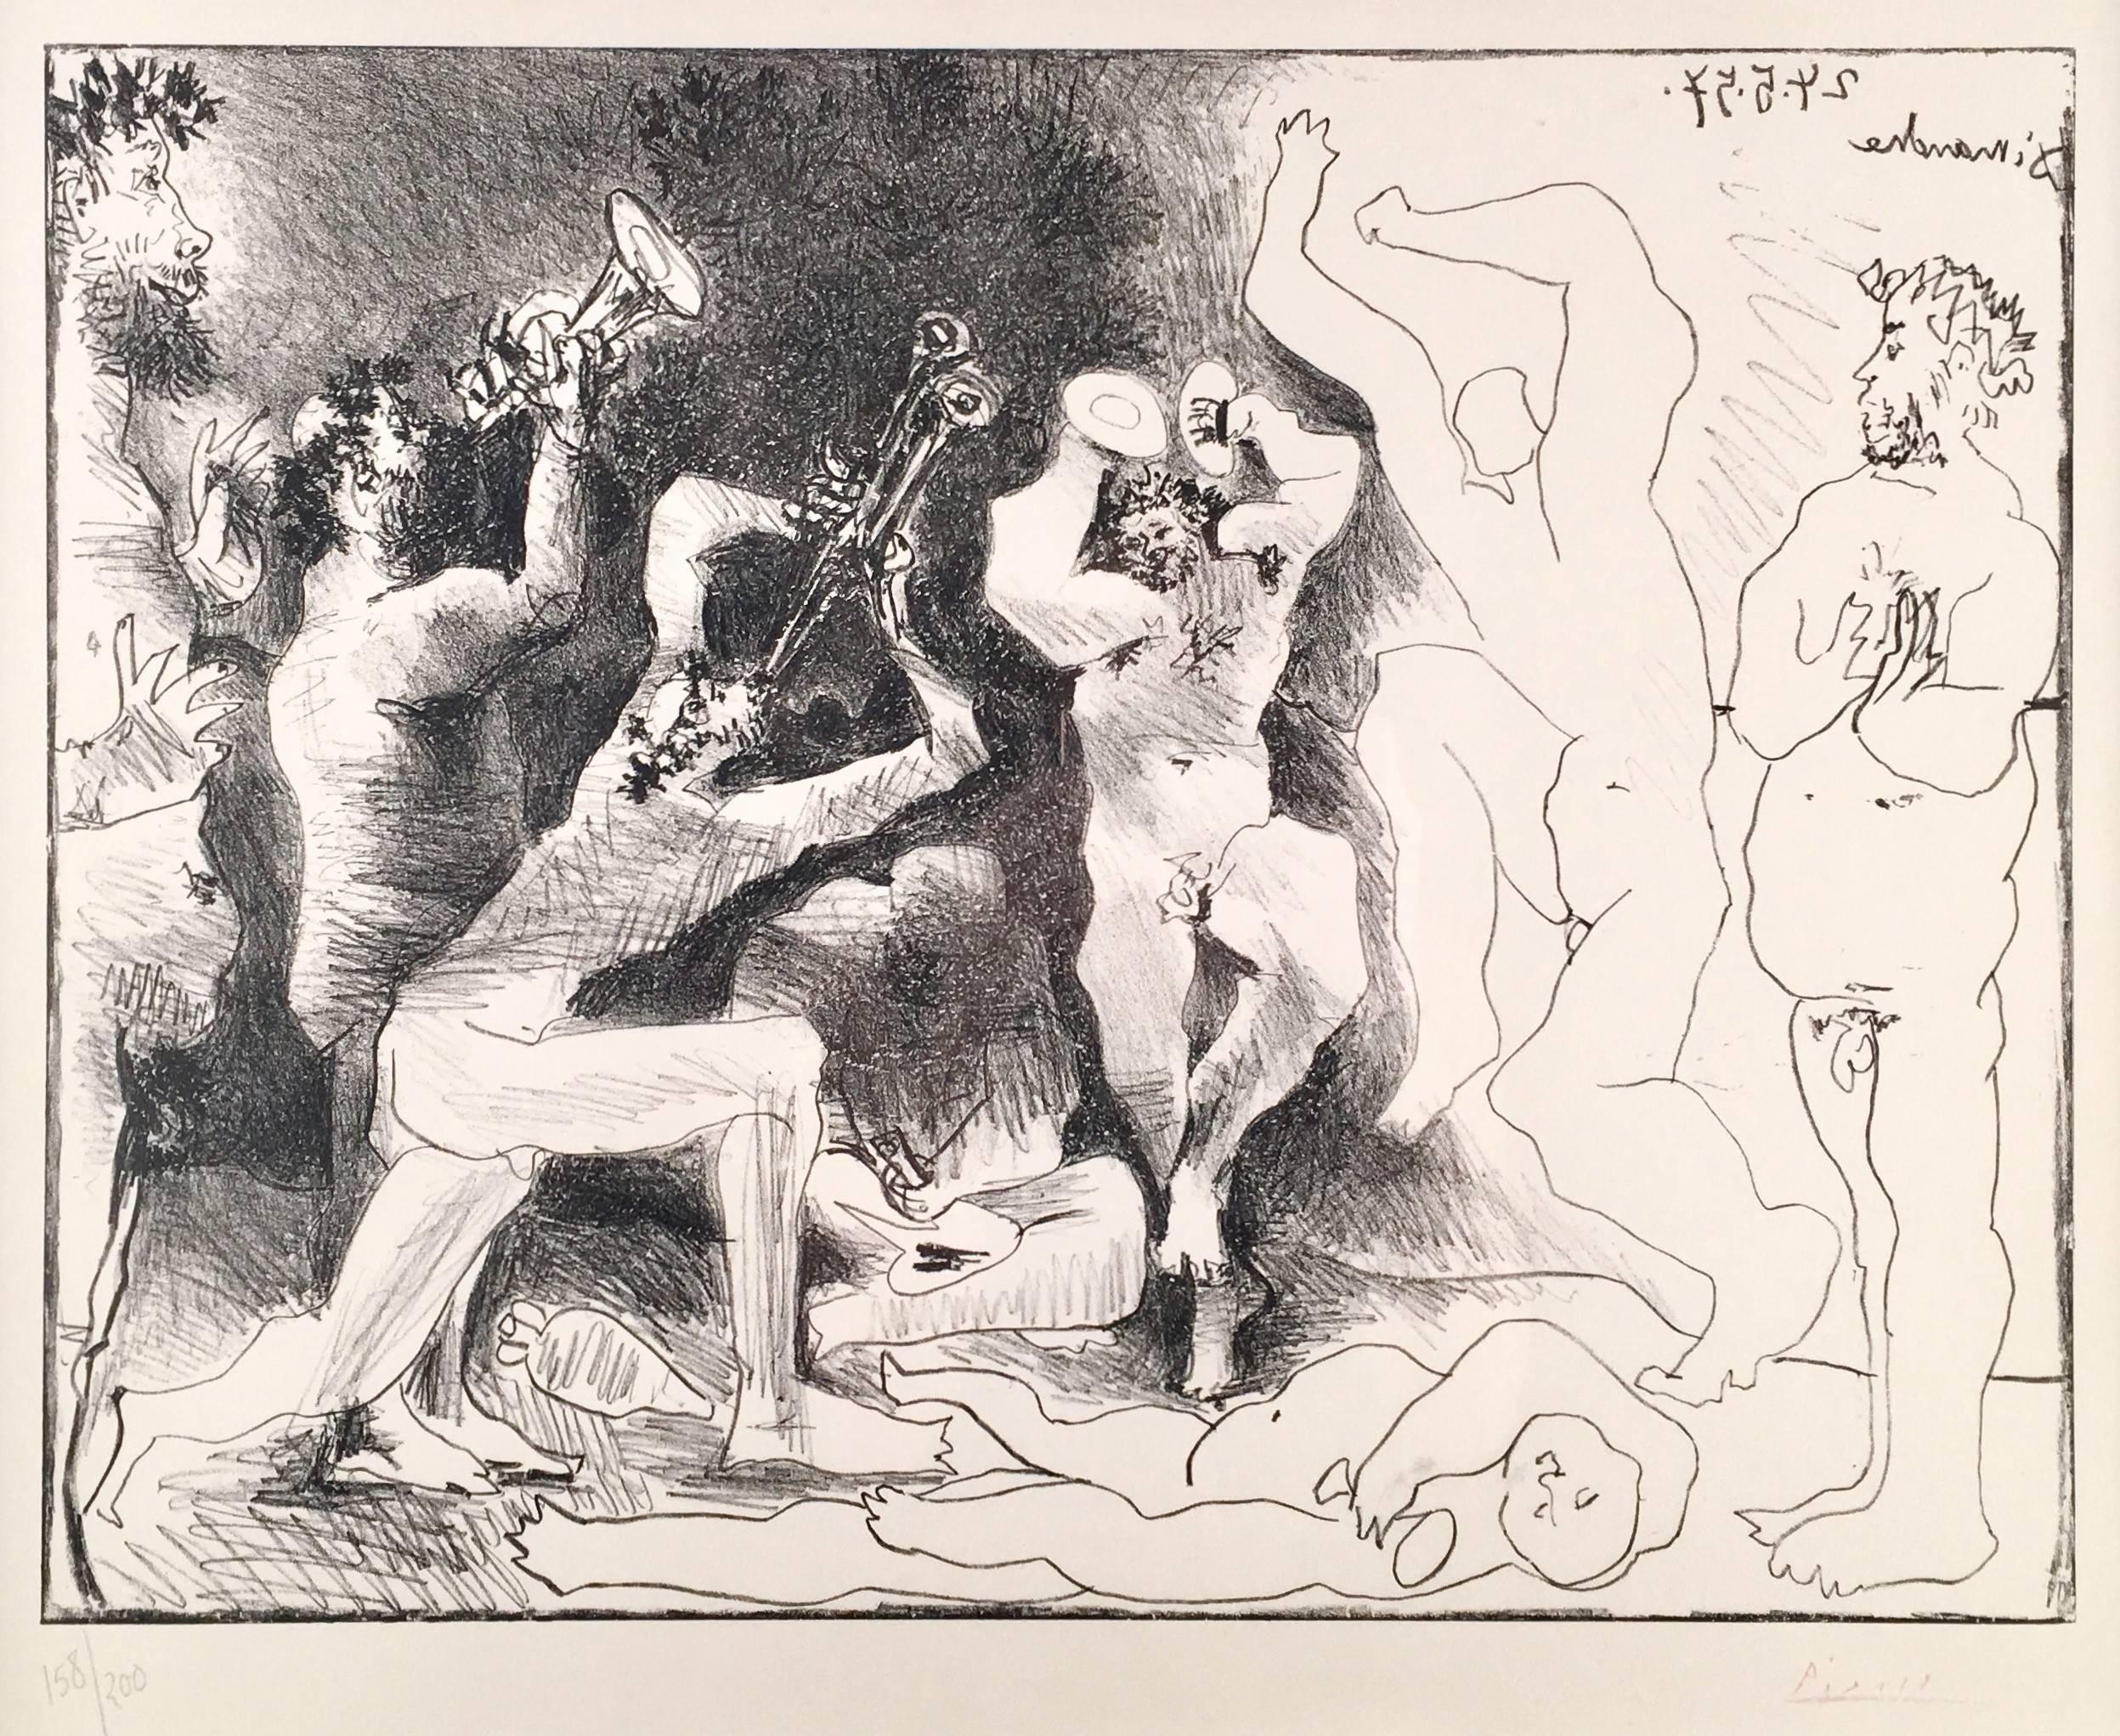 Pablo Picasso, The Fauns Dance